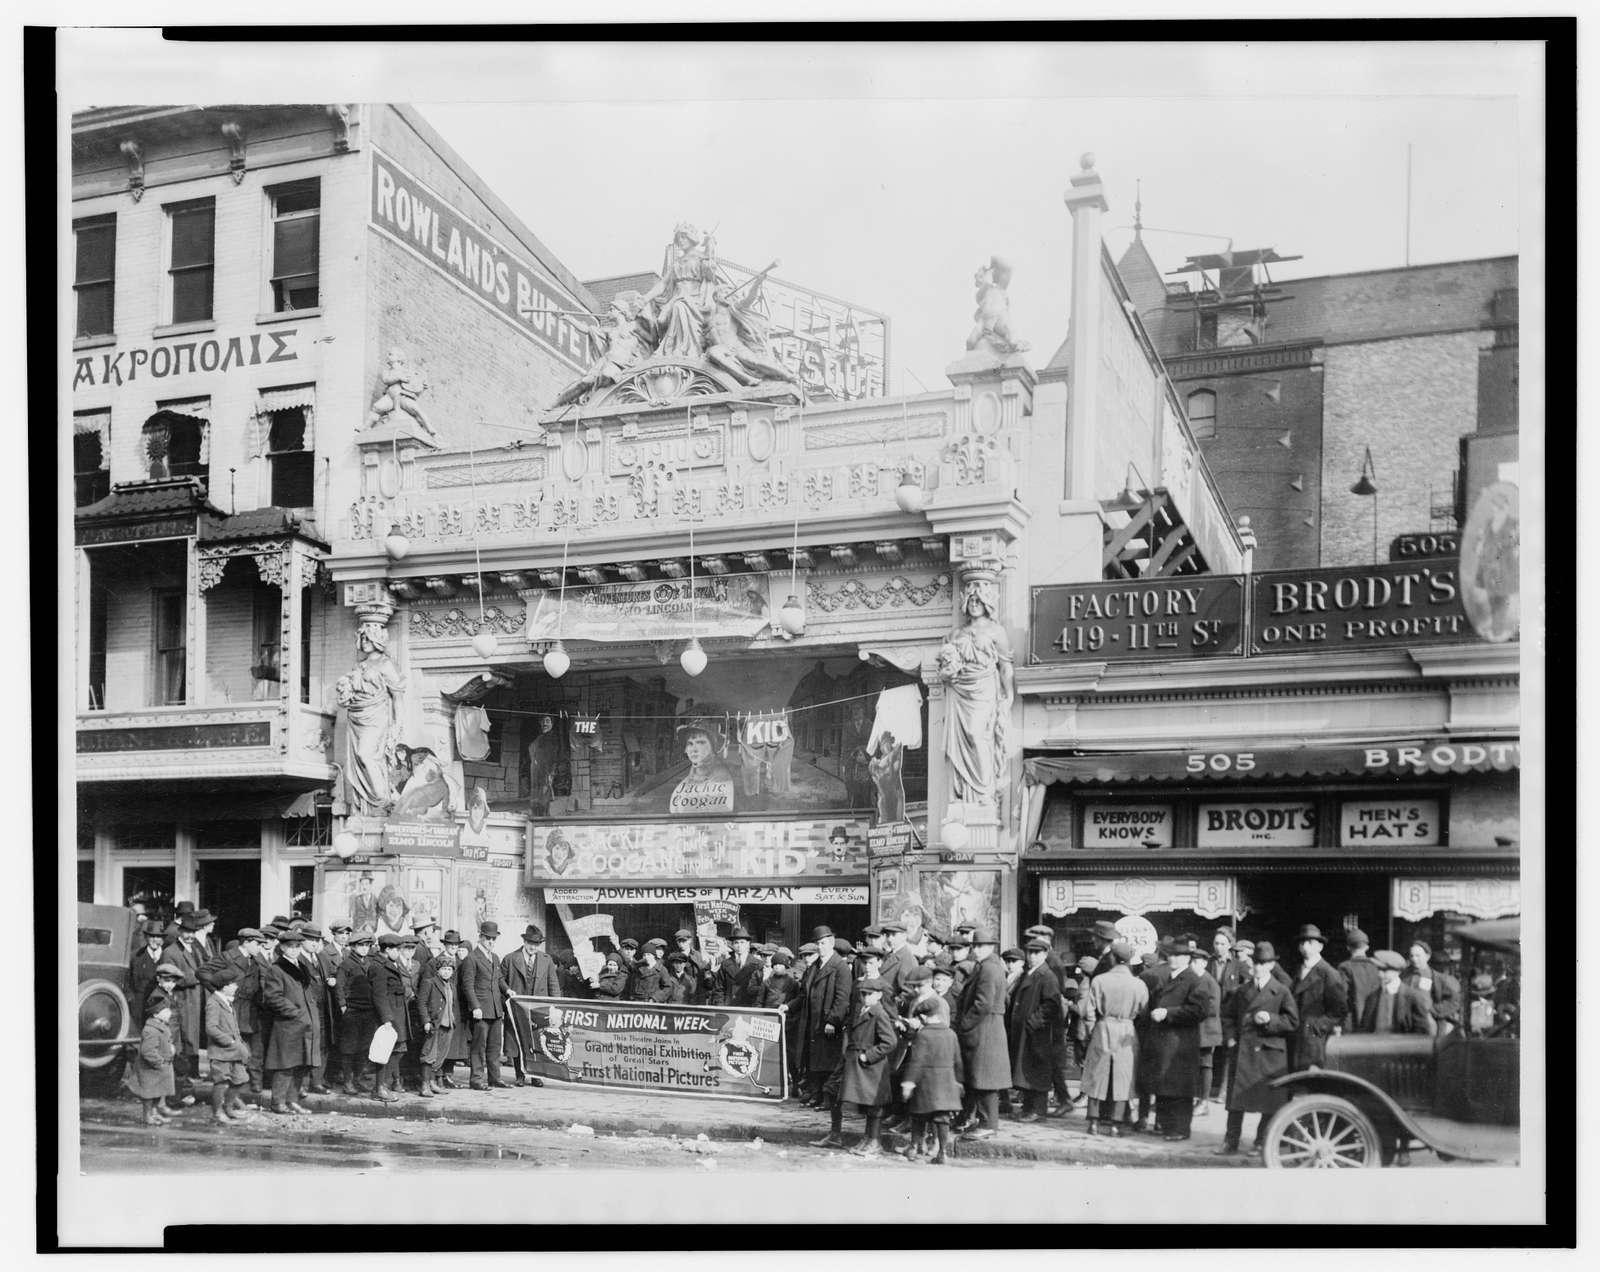 The Leader Theater, 507 Ninth Street, N.W., Washington, D.C.